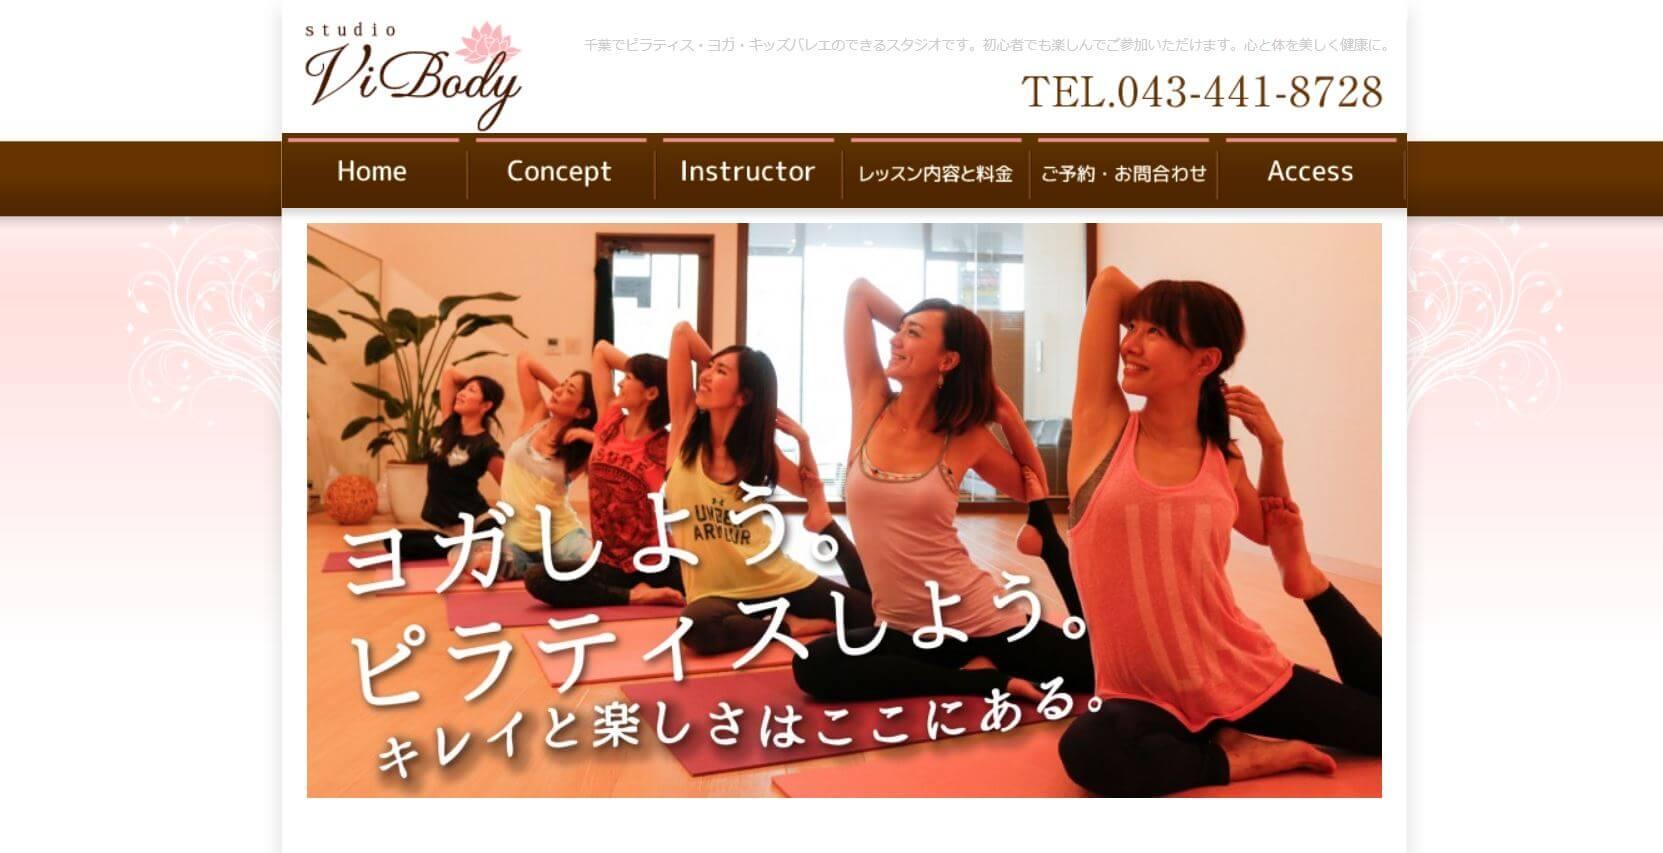 Studio Vi body(ヴィボディ)